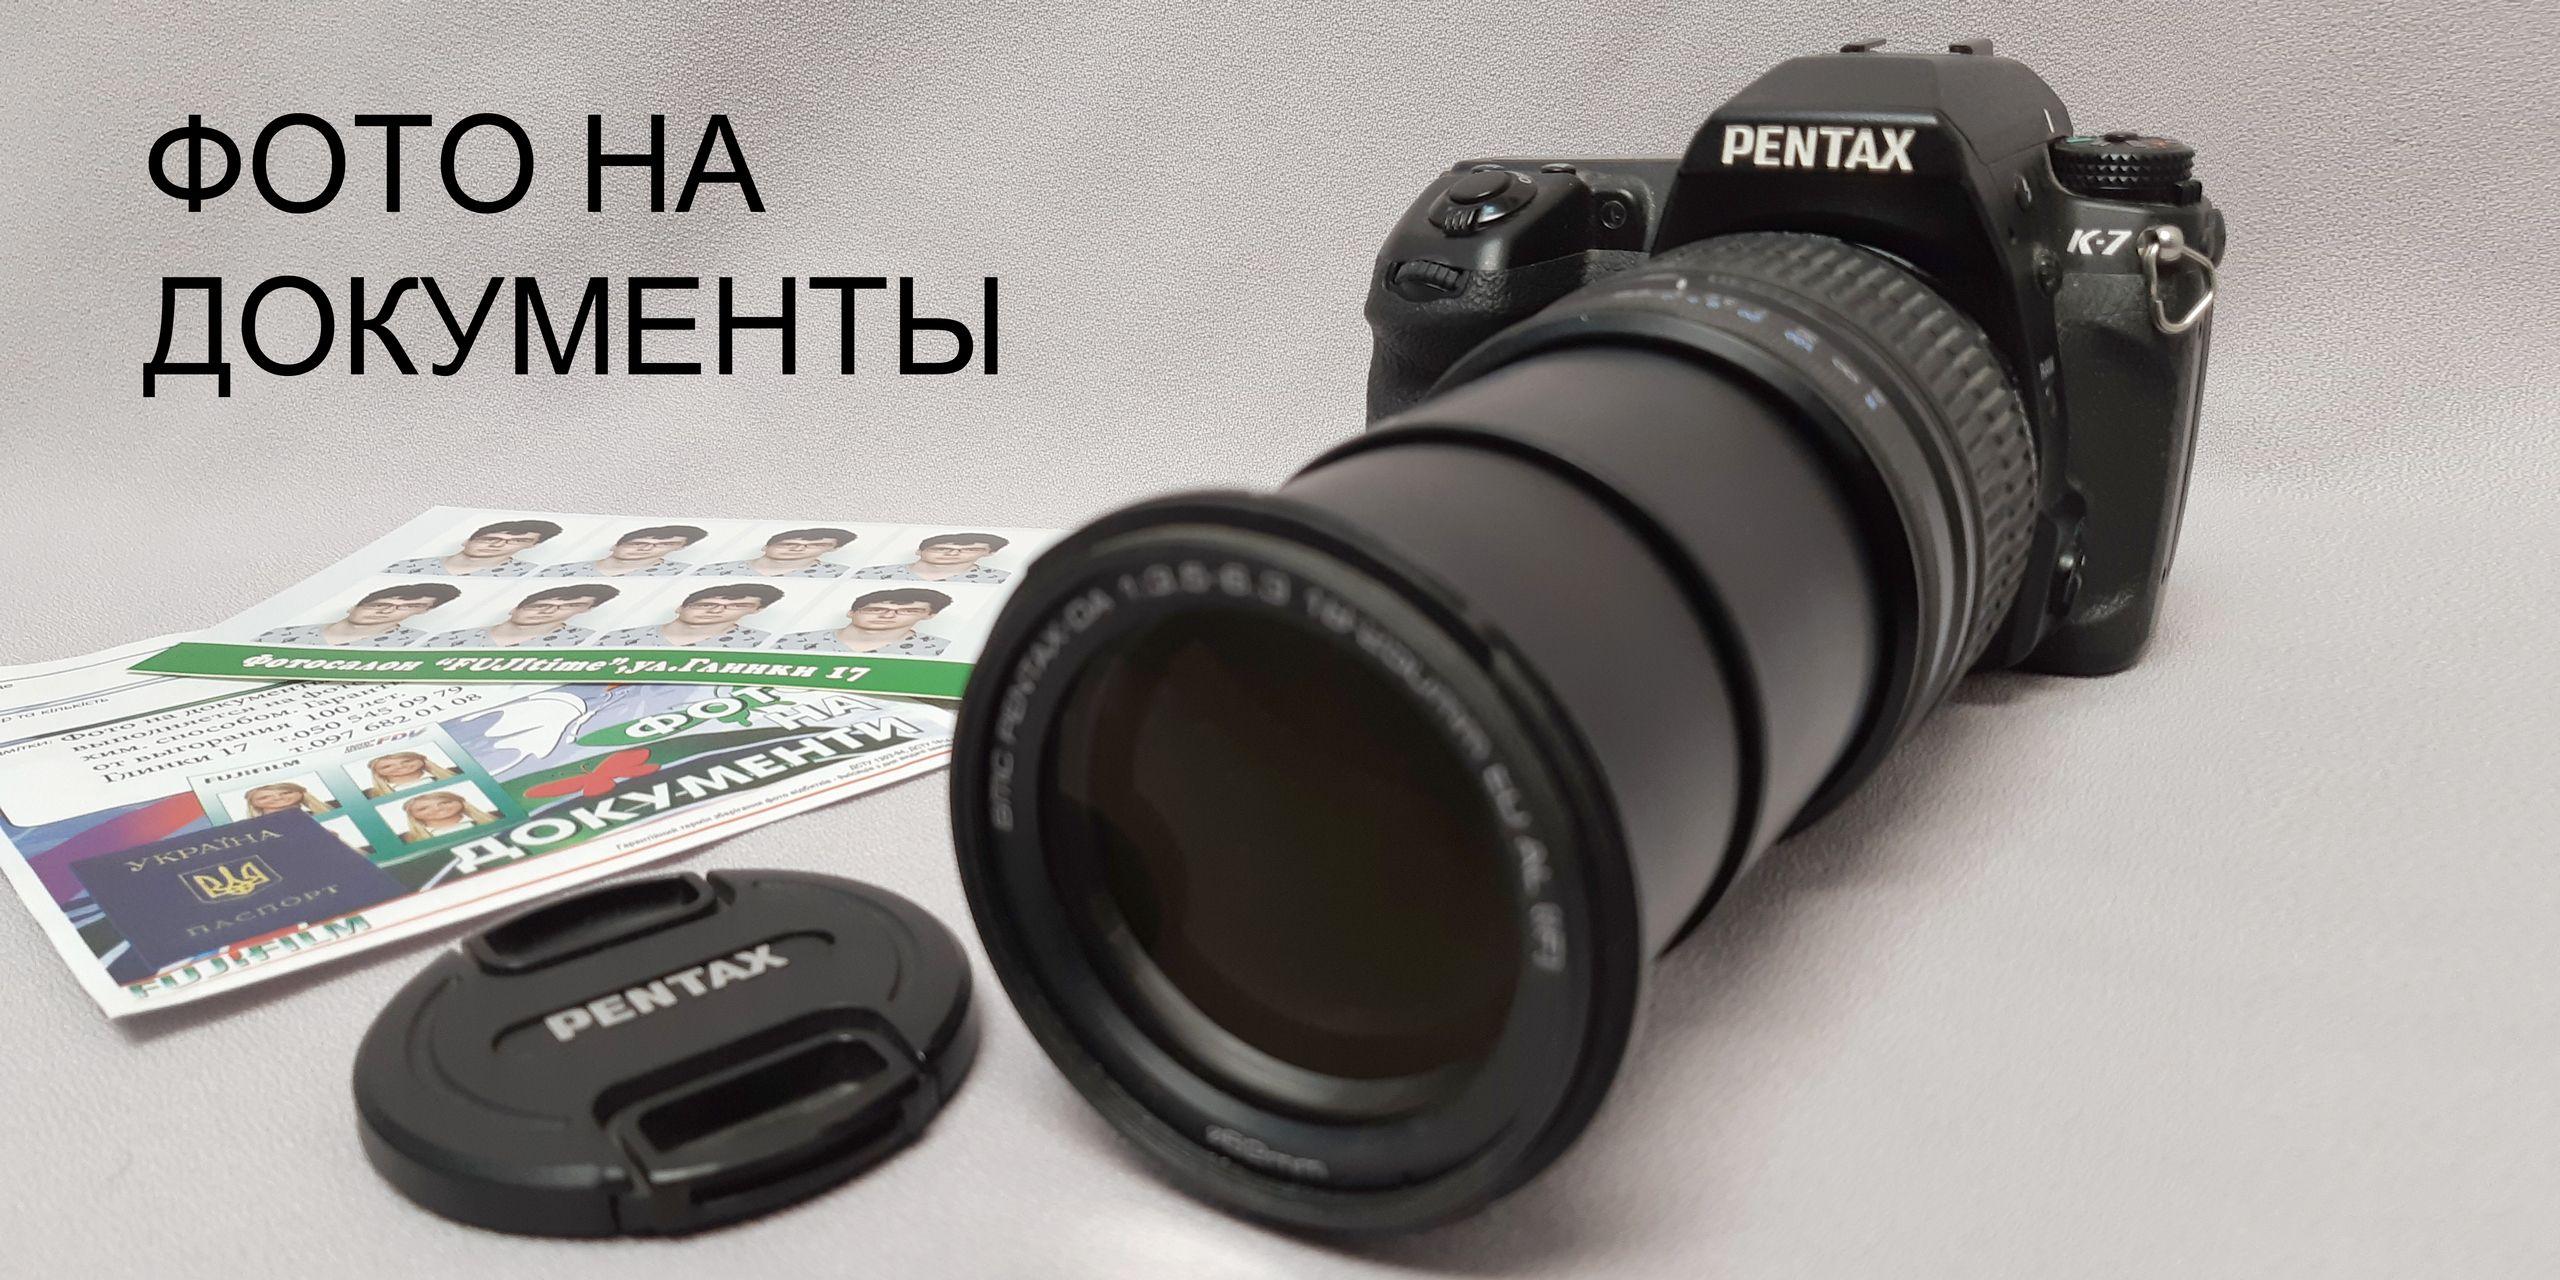 04 foto na documenty